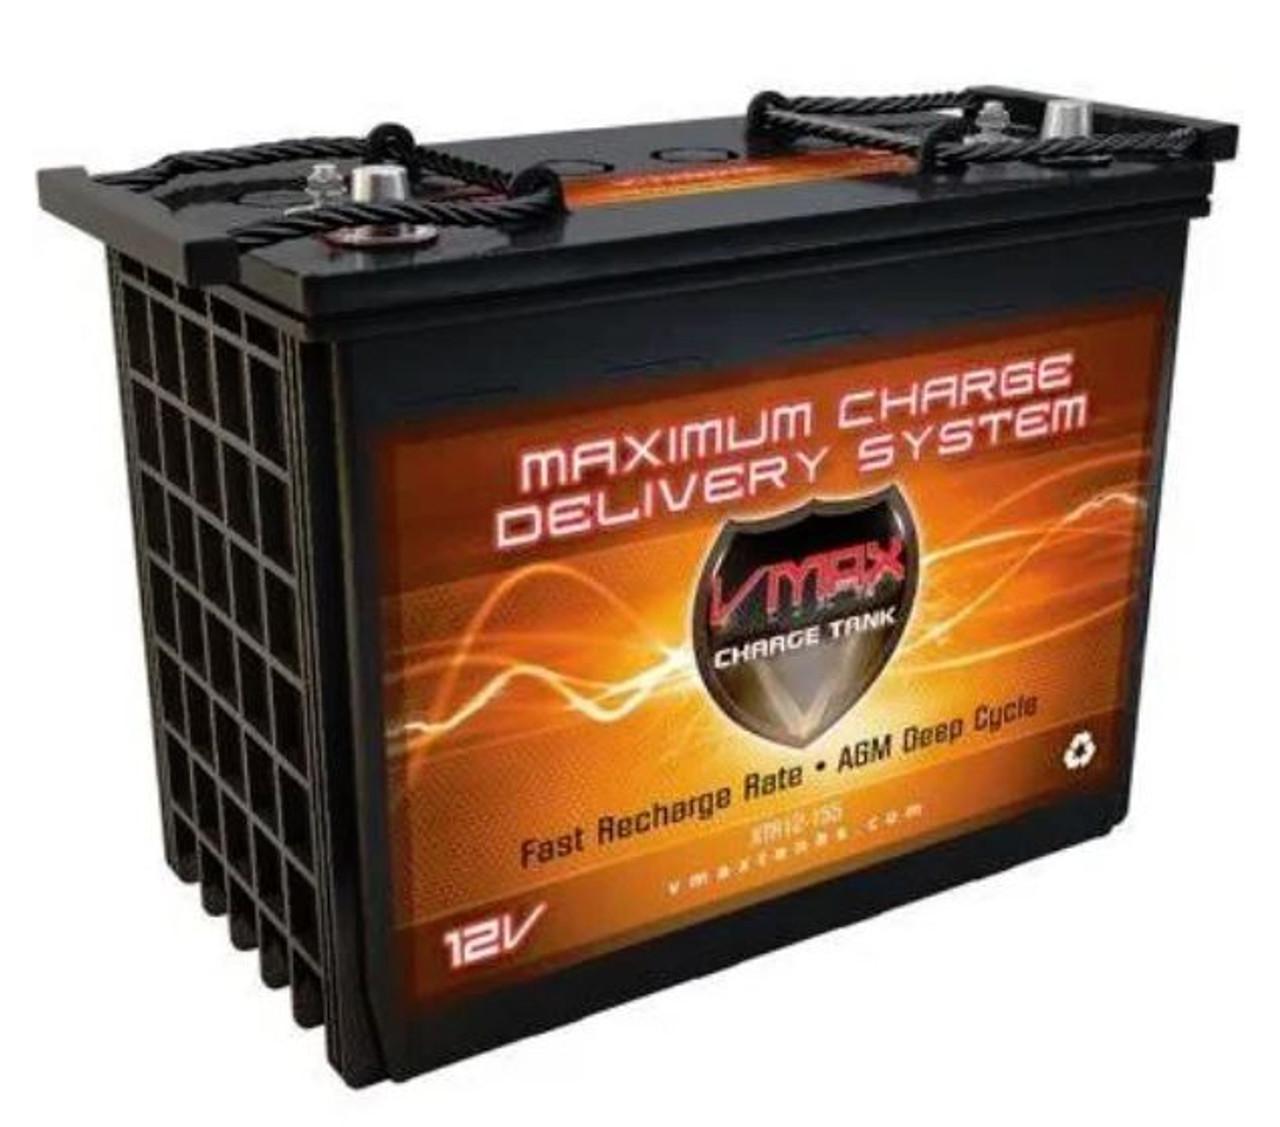 VMAX Charge Tank XTR12-155 12 Volts 155AH Deep Cycle, XTREME AGM Battery